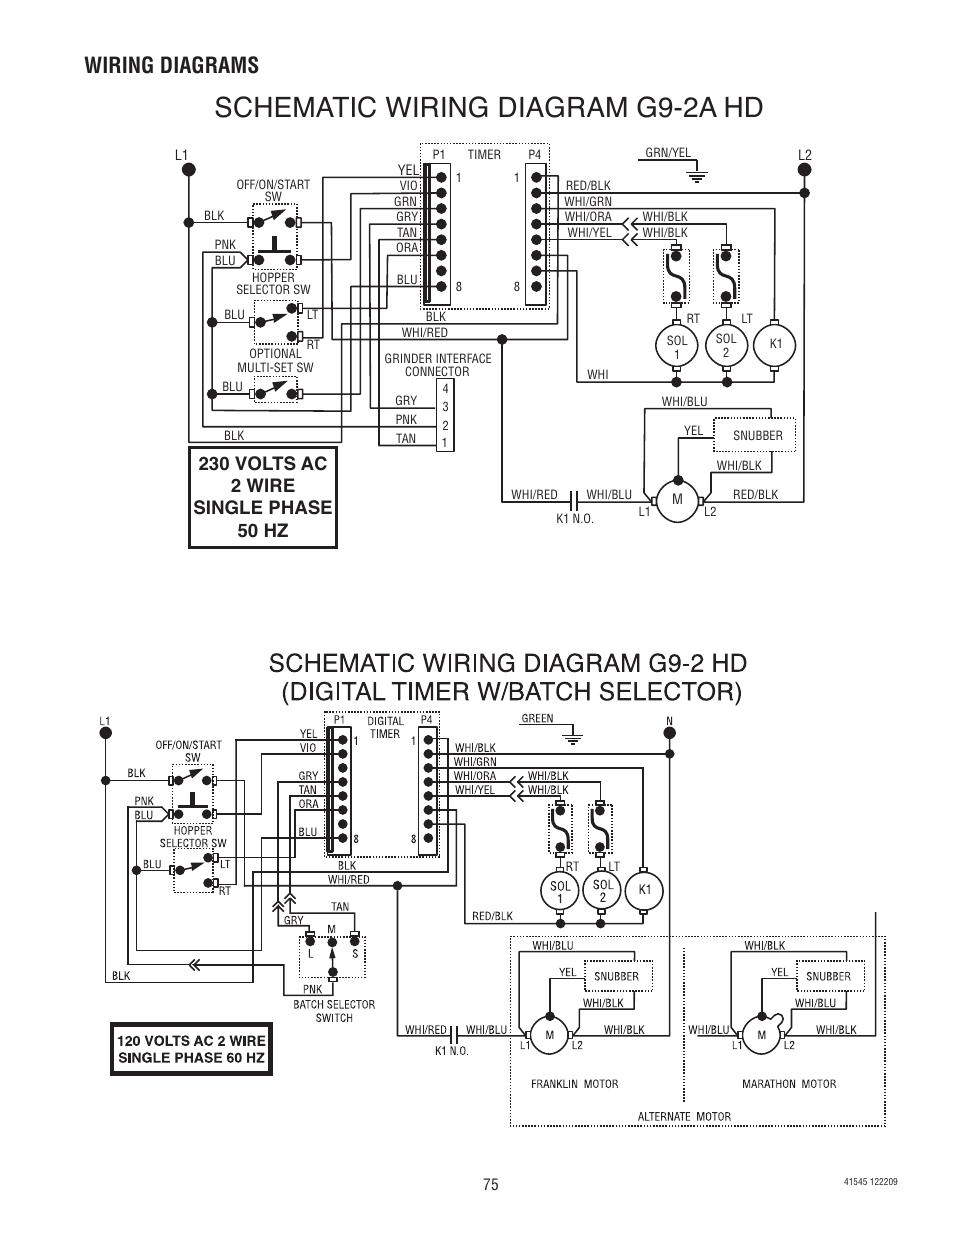 medium resolution of schematic wiring diagram g9 2a hd wiring diagrams bunn g9 2t dbc rh manualsdir com bunn coffee maker single bunn coffee pot parts list